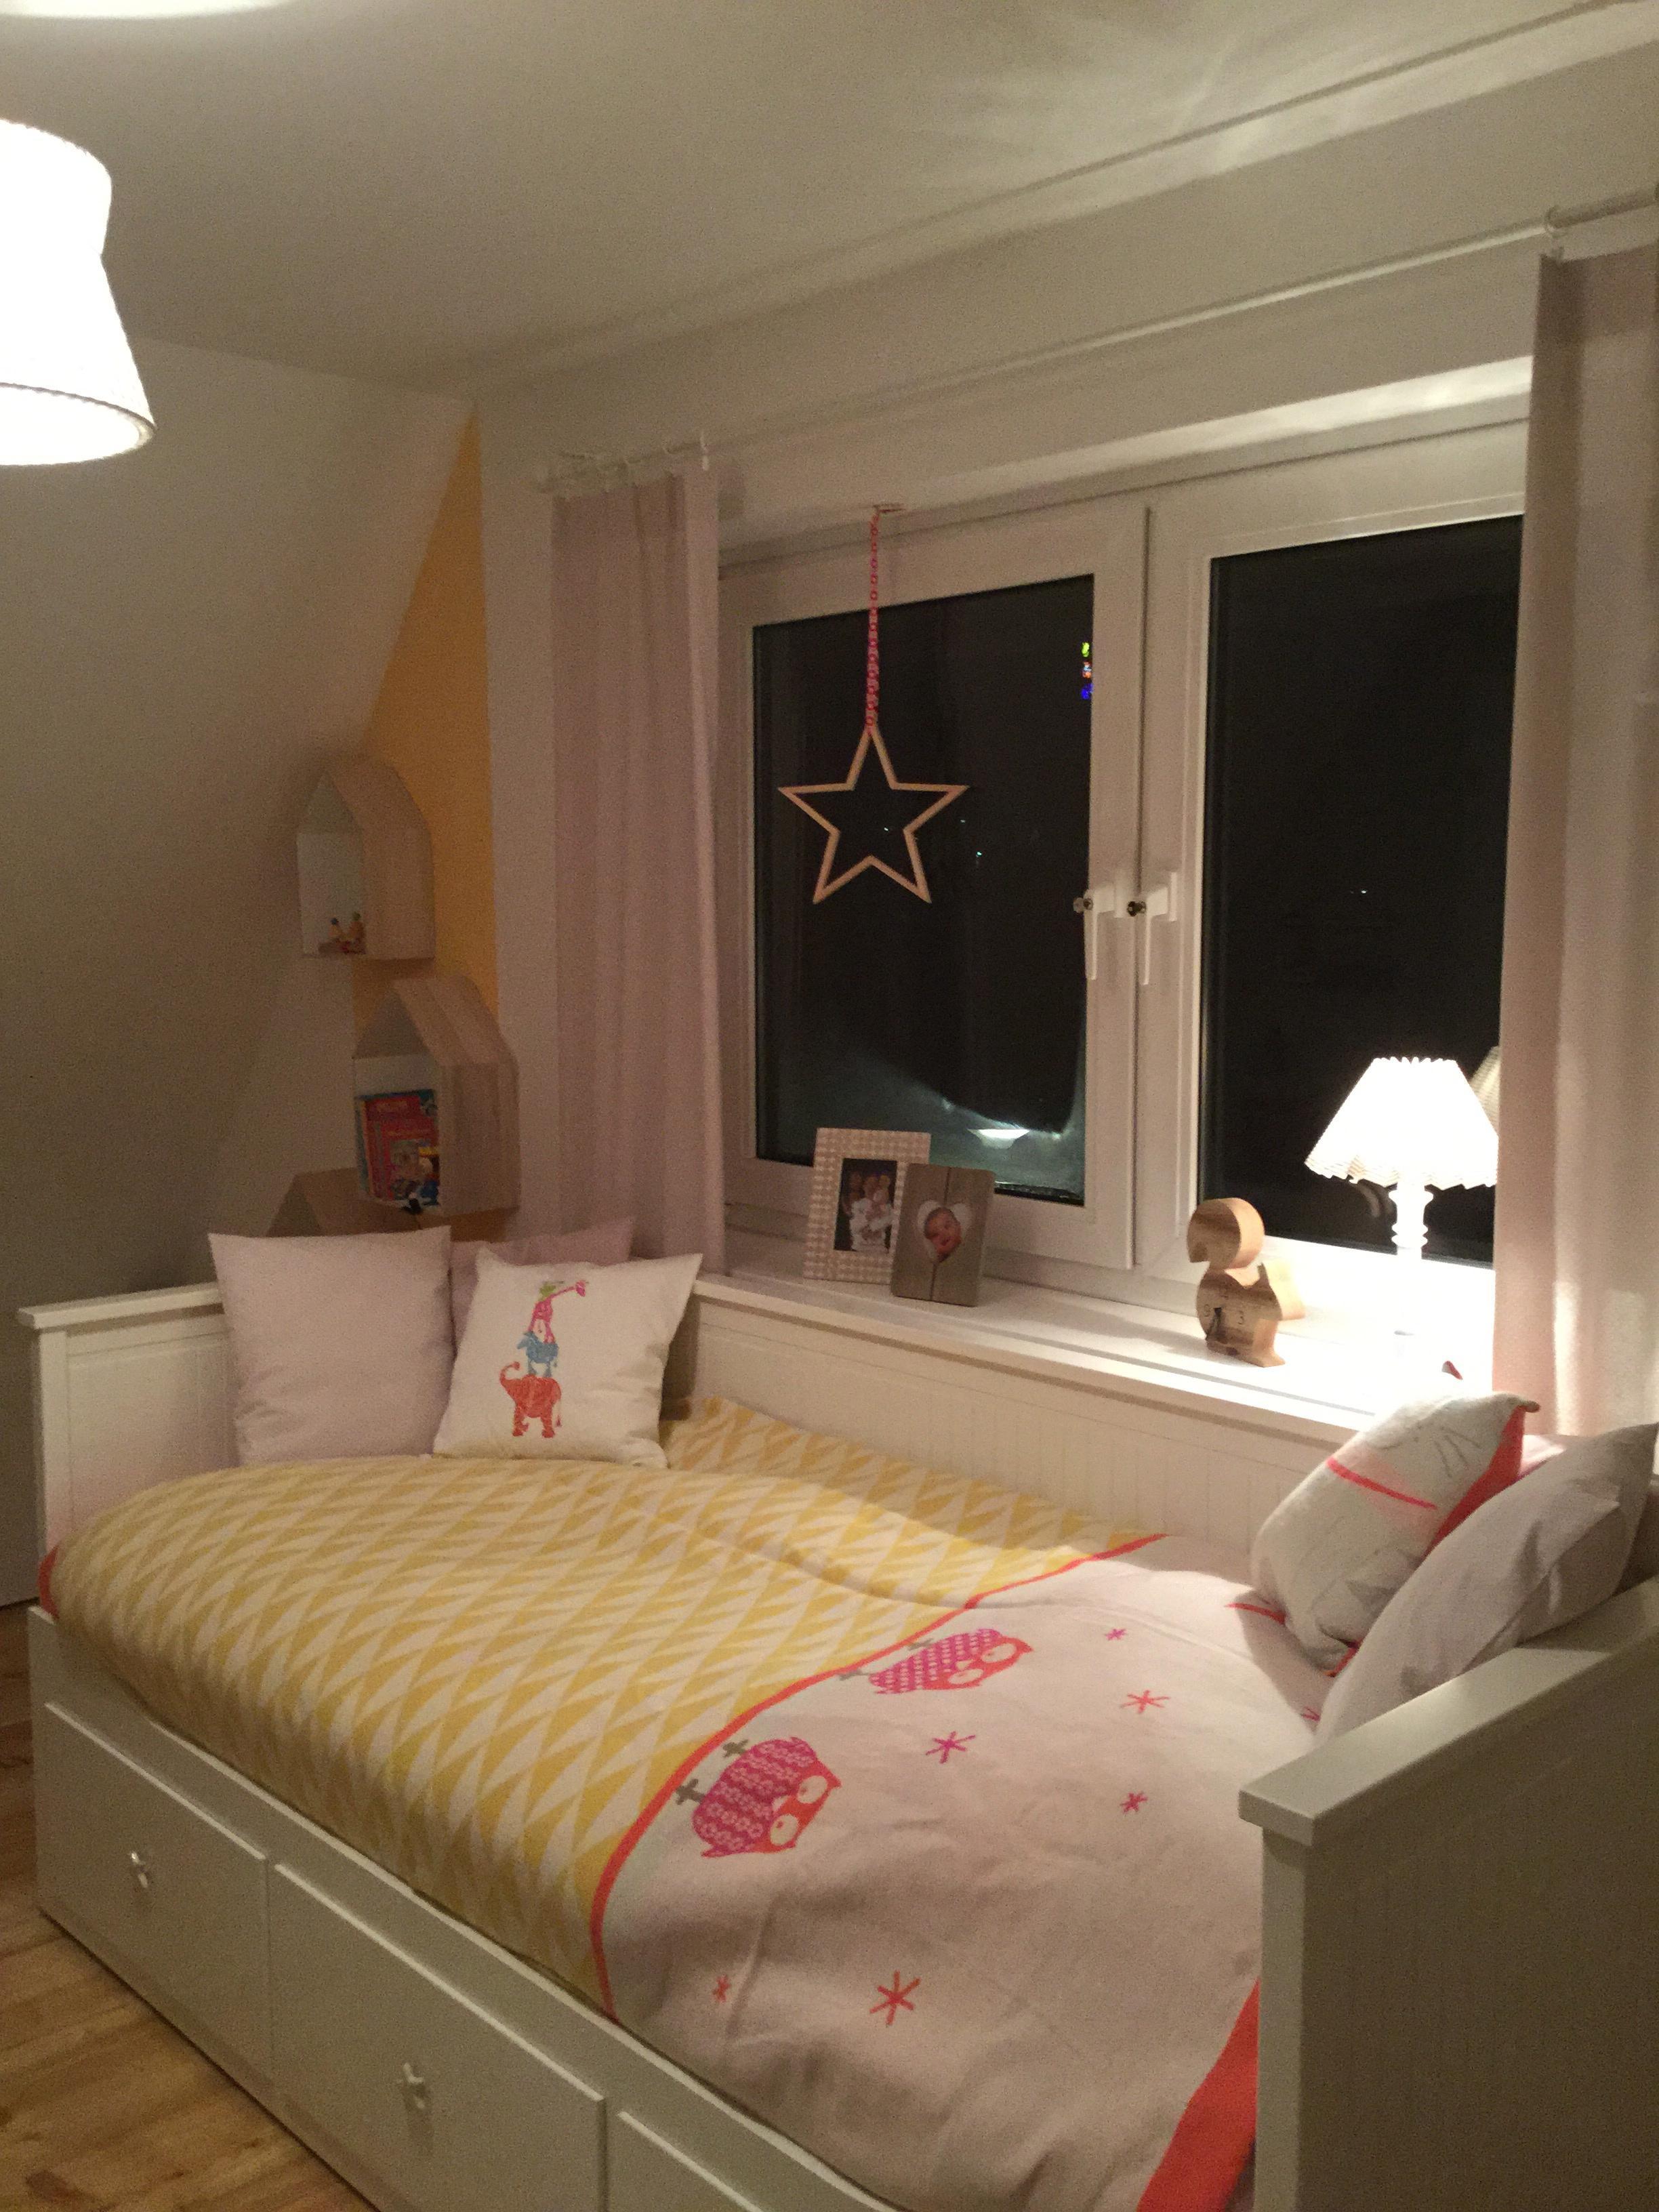 Gemütliches Bett Bett Regal Tagesdecke Kissen I